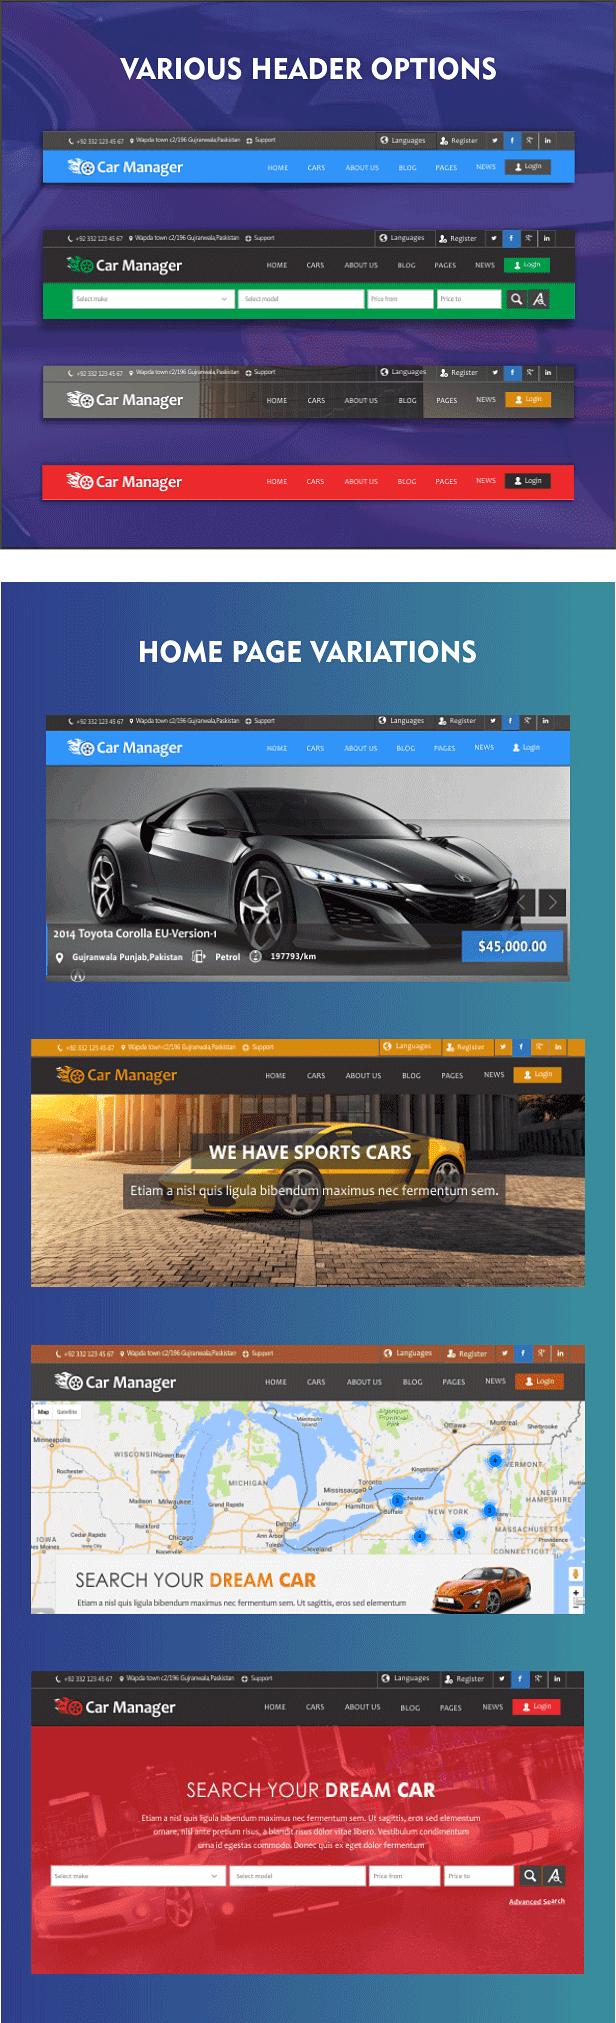 Car Manager - Car Dealership Business WordPress Theme by joomsky ...